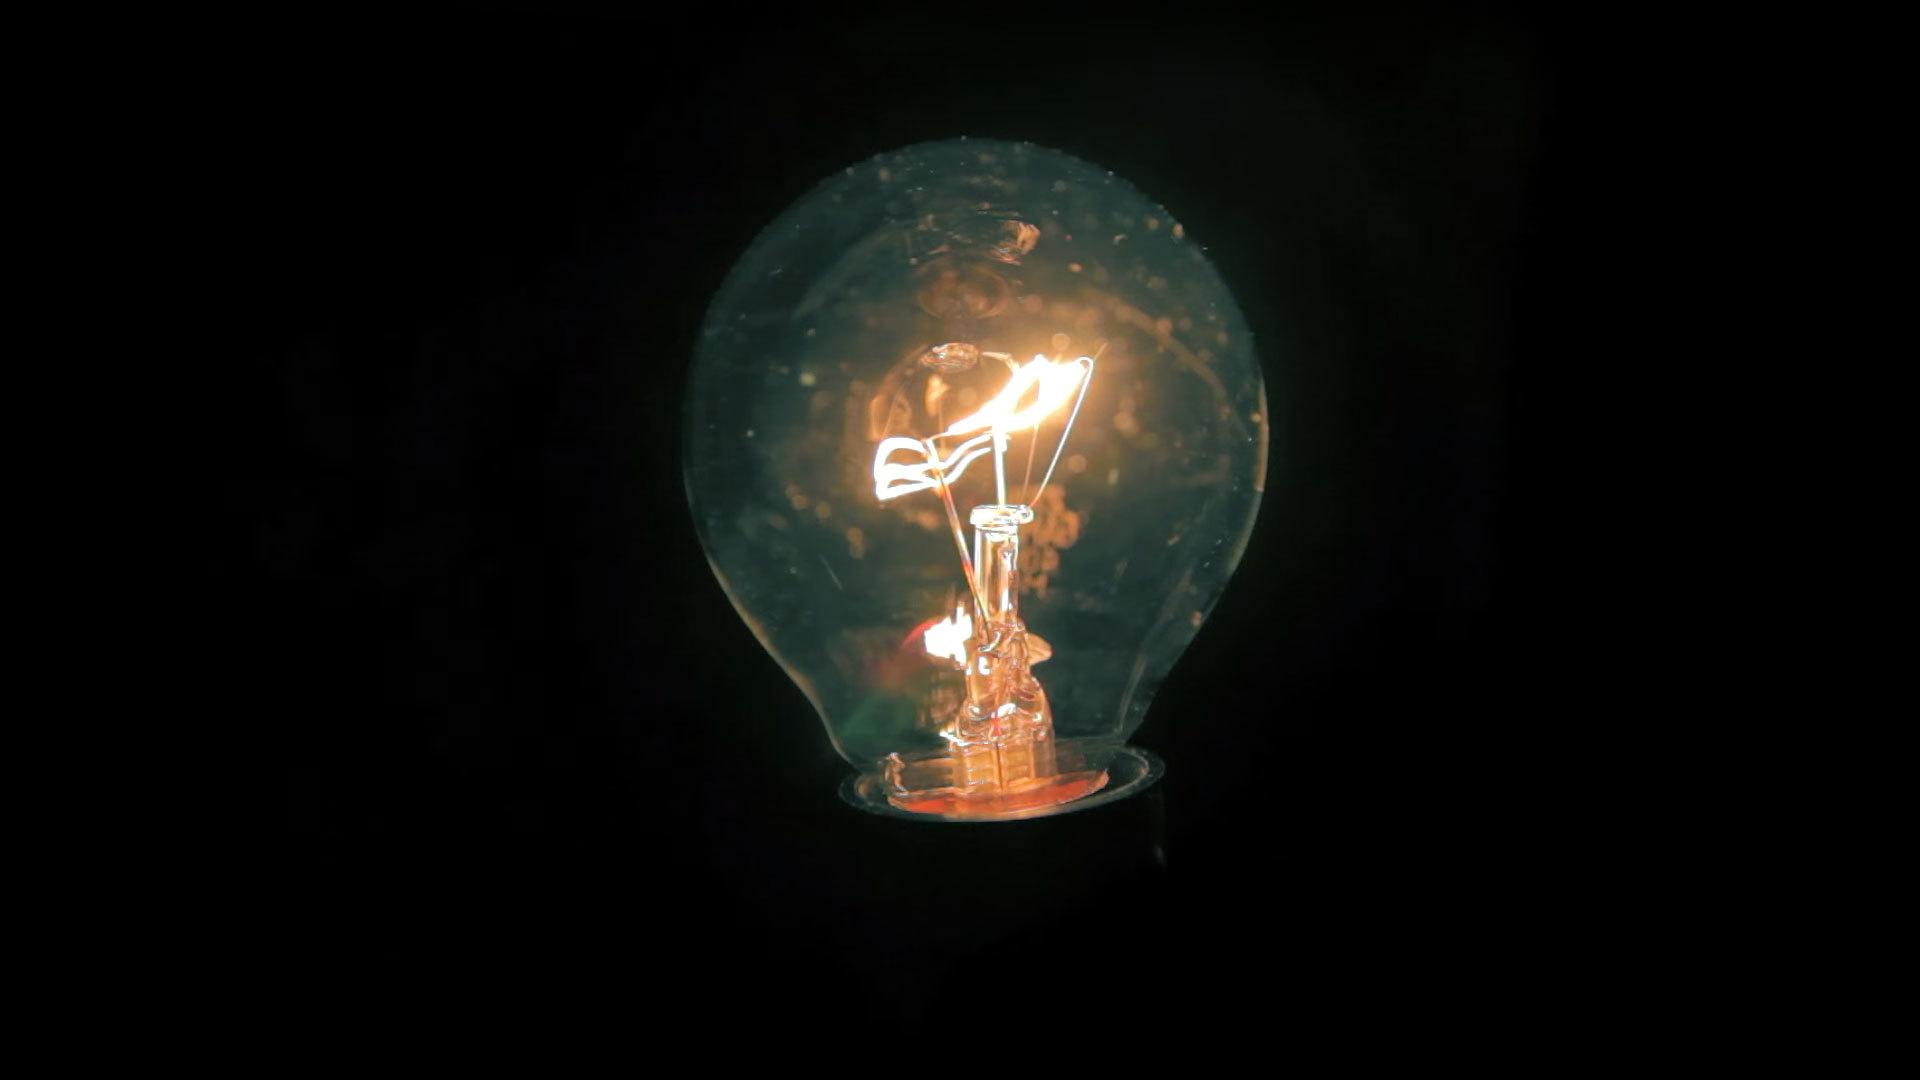 http://www.coolstreaming.us/blog/wp-content/uploads/Lampi_di_genio_1920_dijkkj.jpg